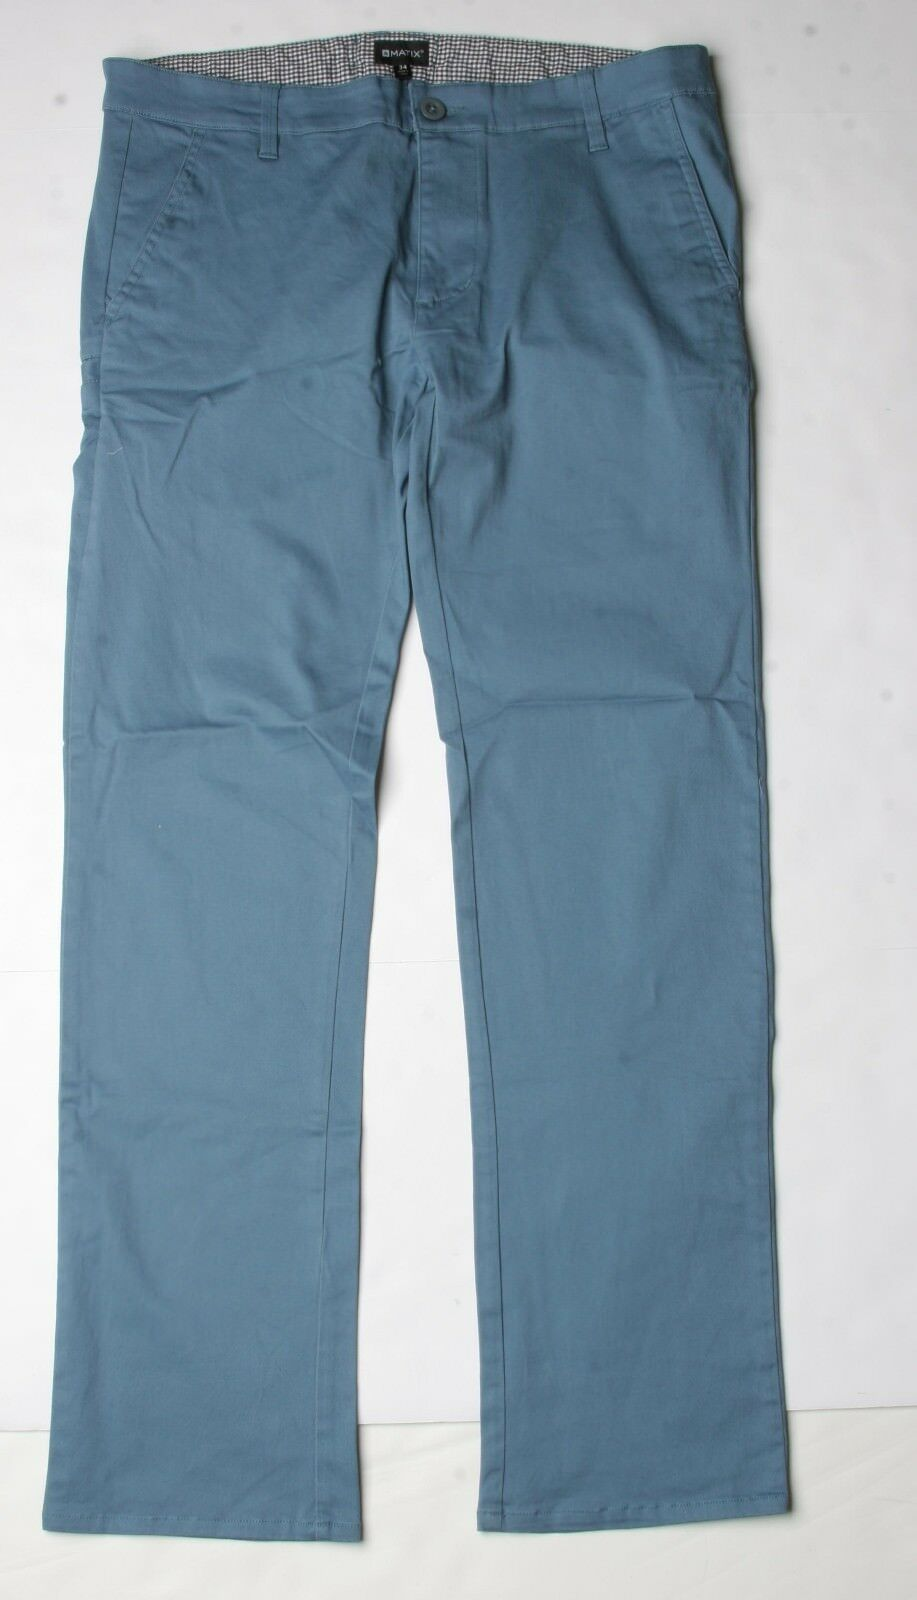 Matix Gripper Bedford Pant (32) Slate